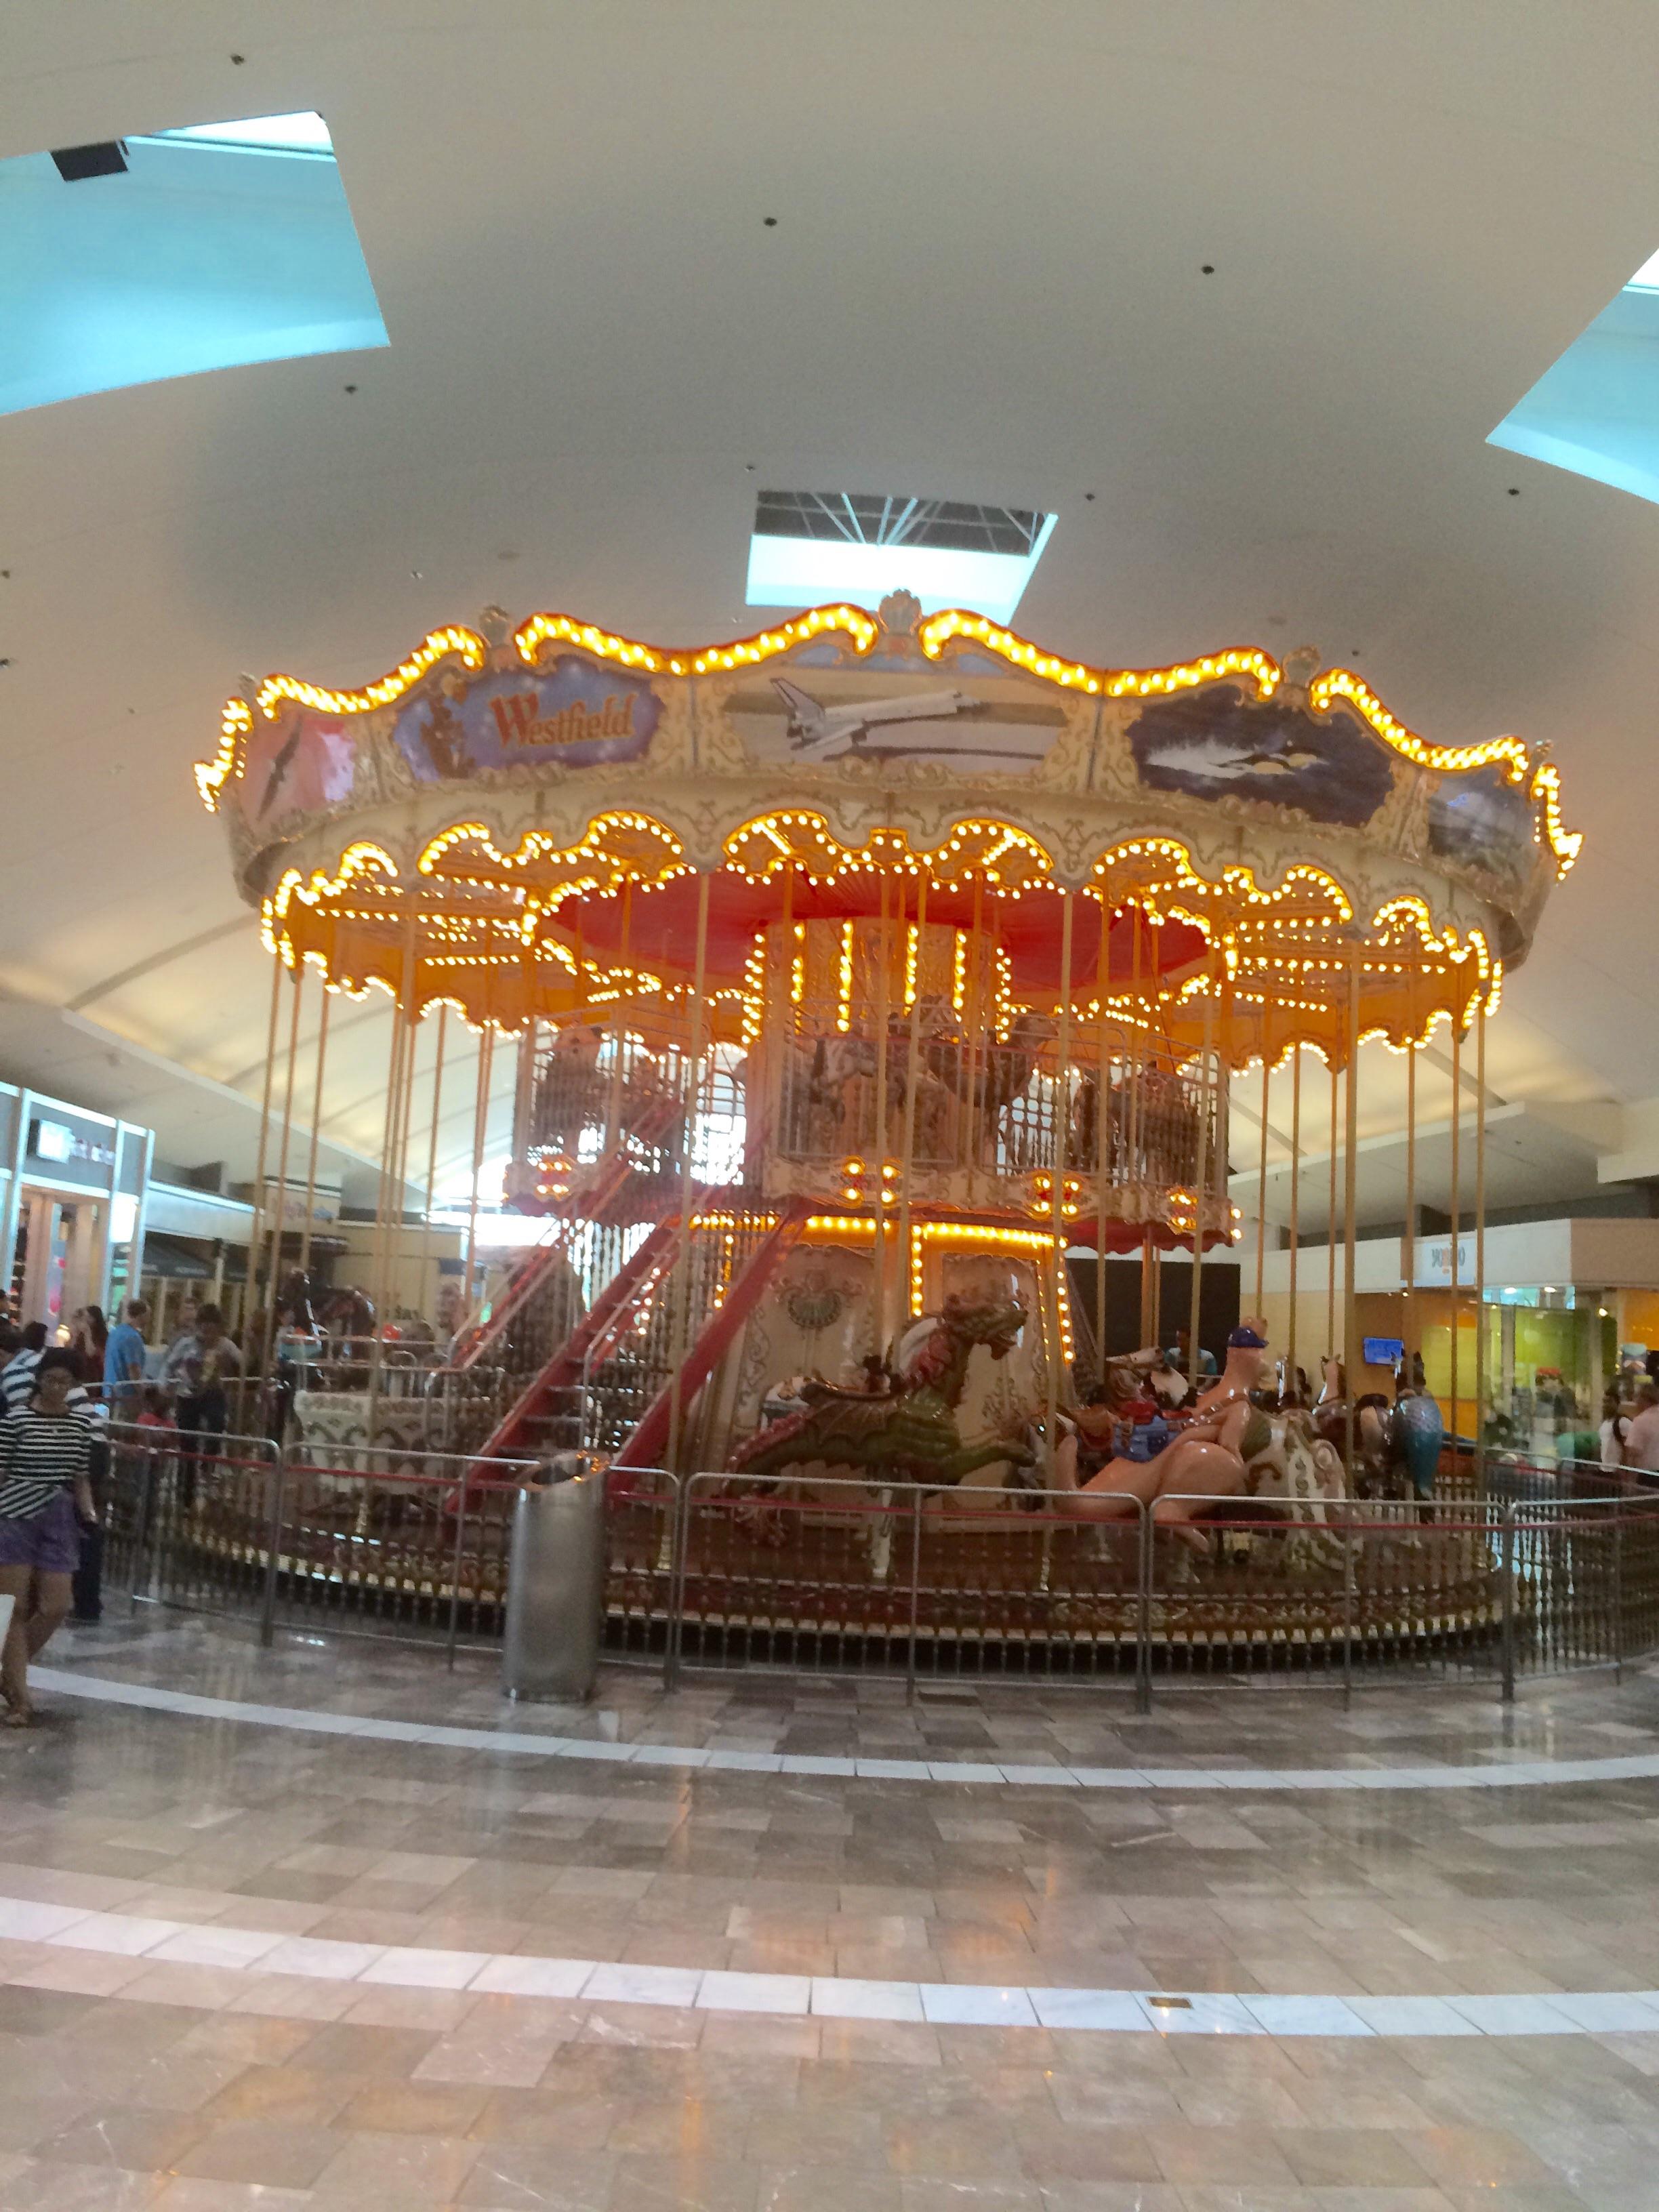 FileCarousel at Garden State Plaza , Wikimedia Commons